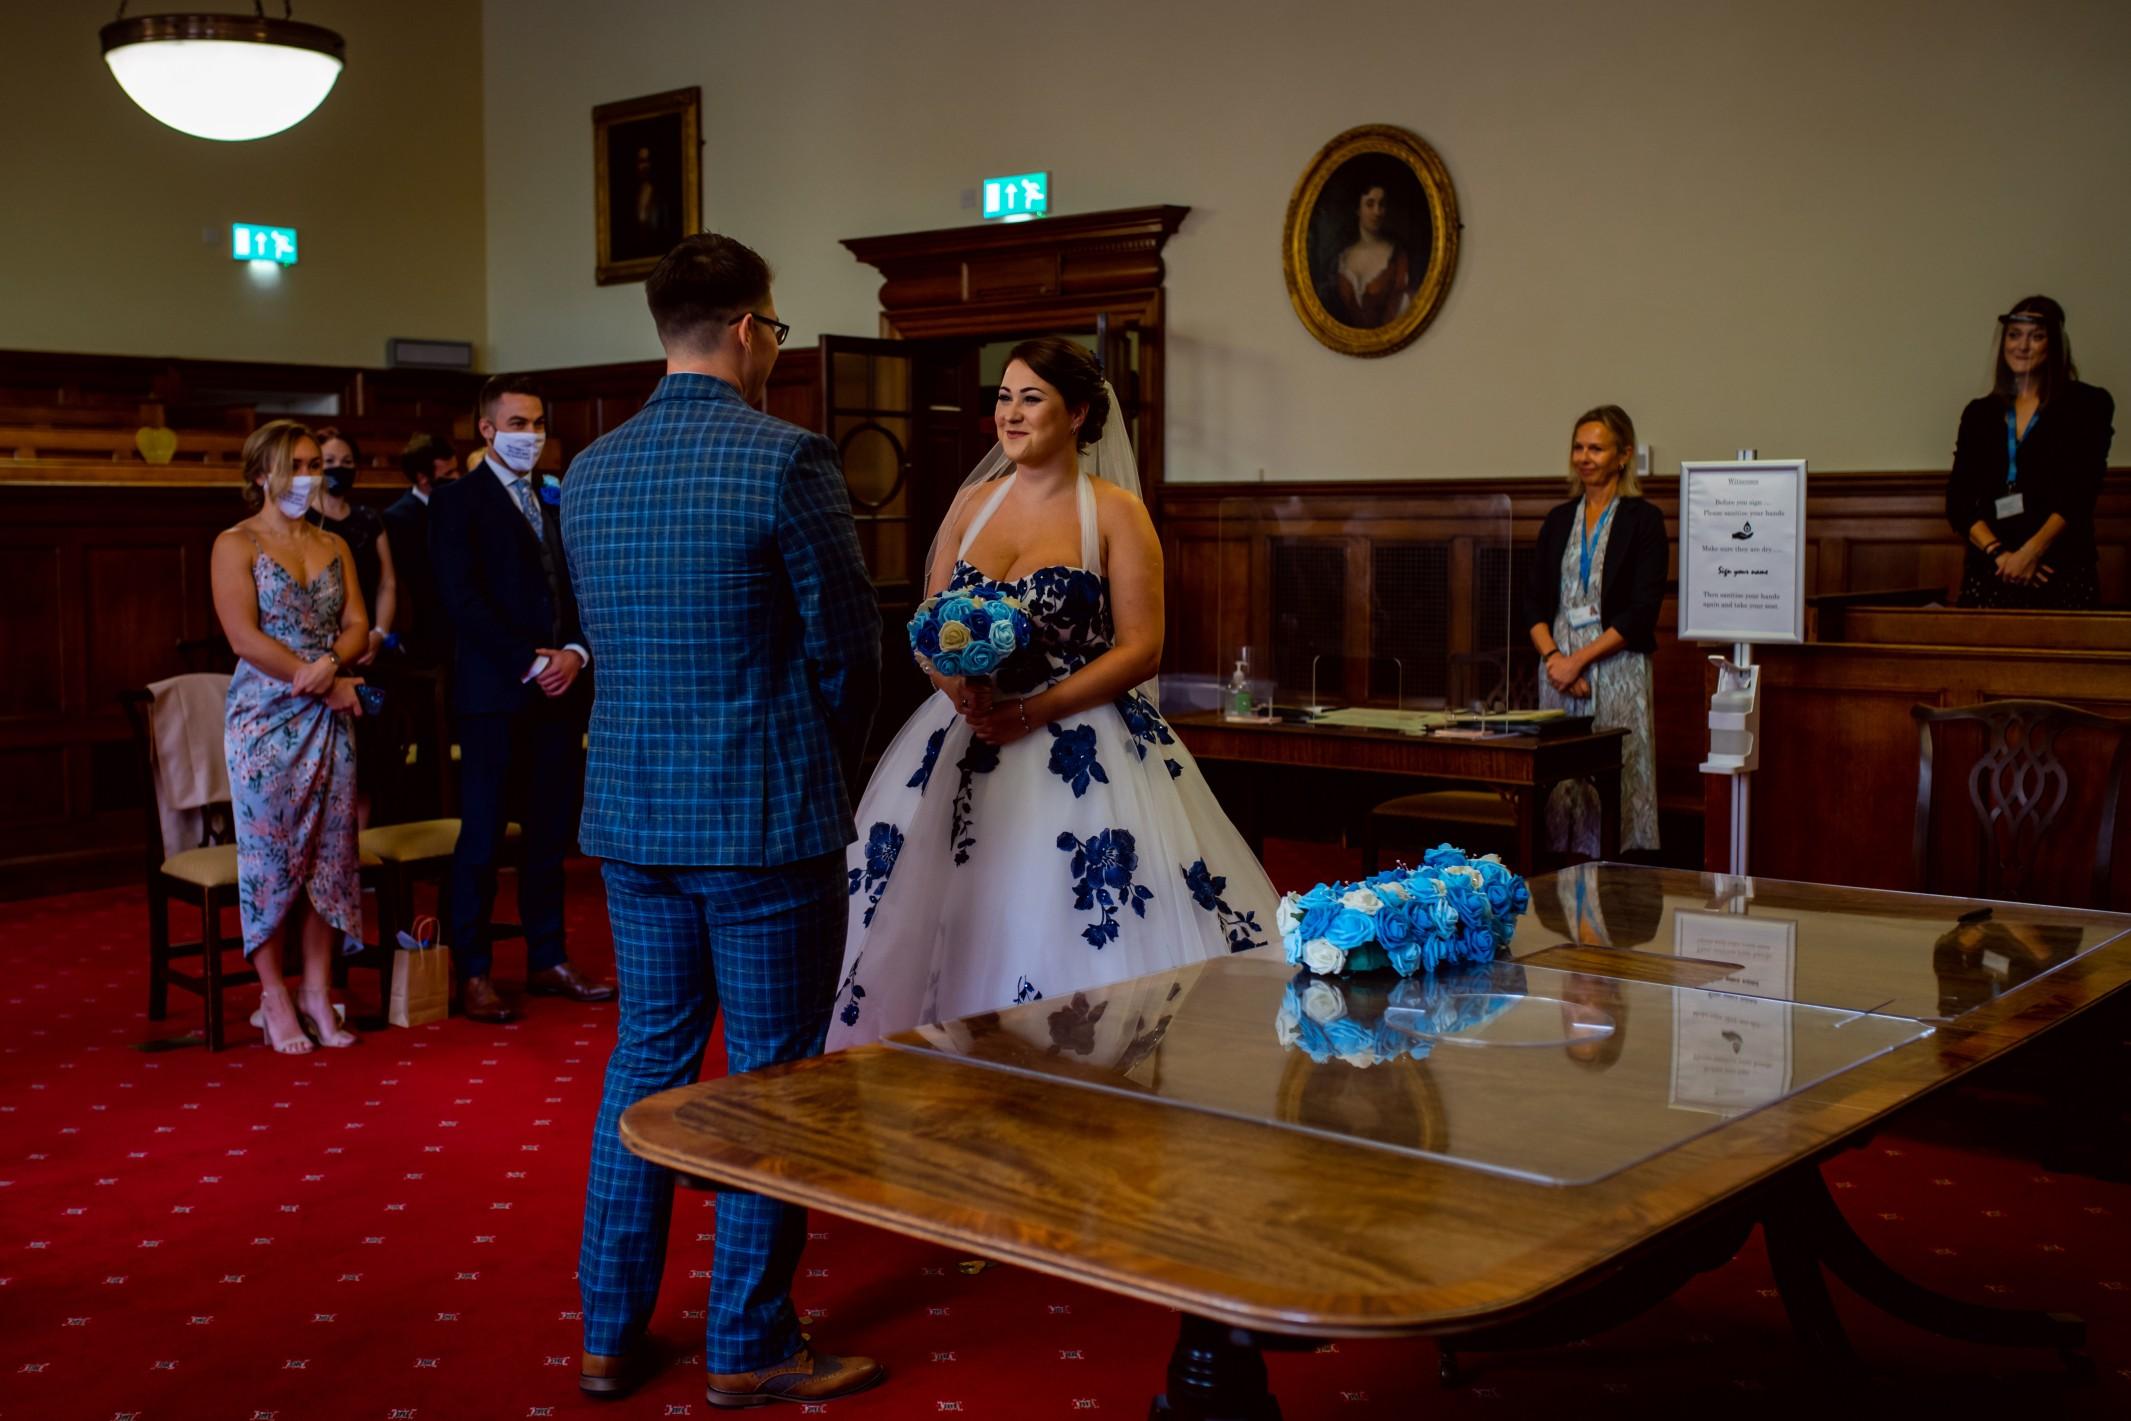 creative covid wedding - covid wedding ceremony - pandemic wedding - small wedding ceremony